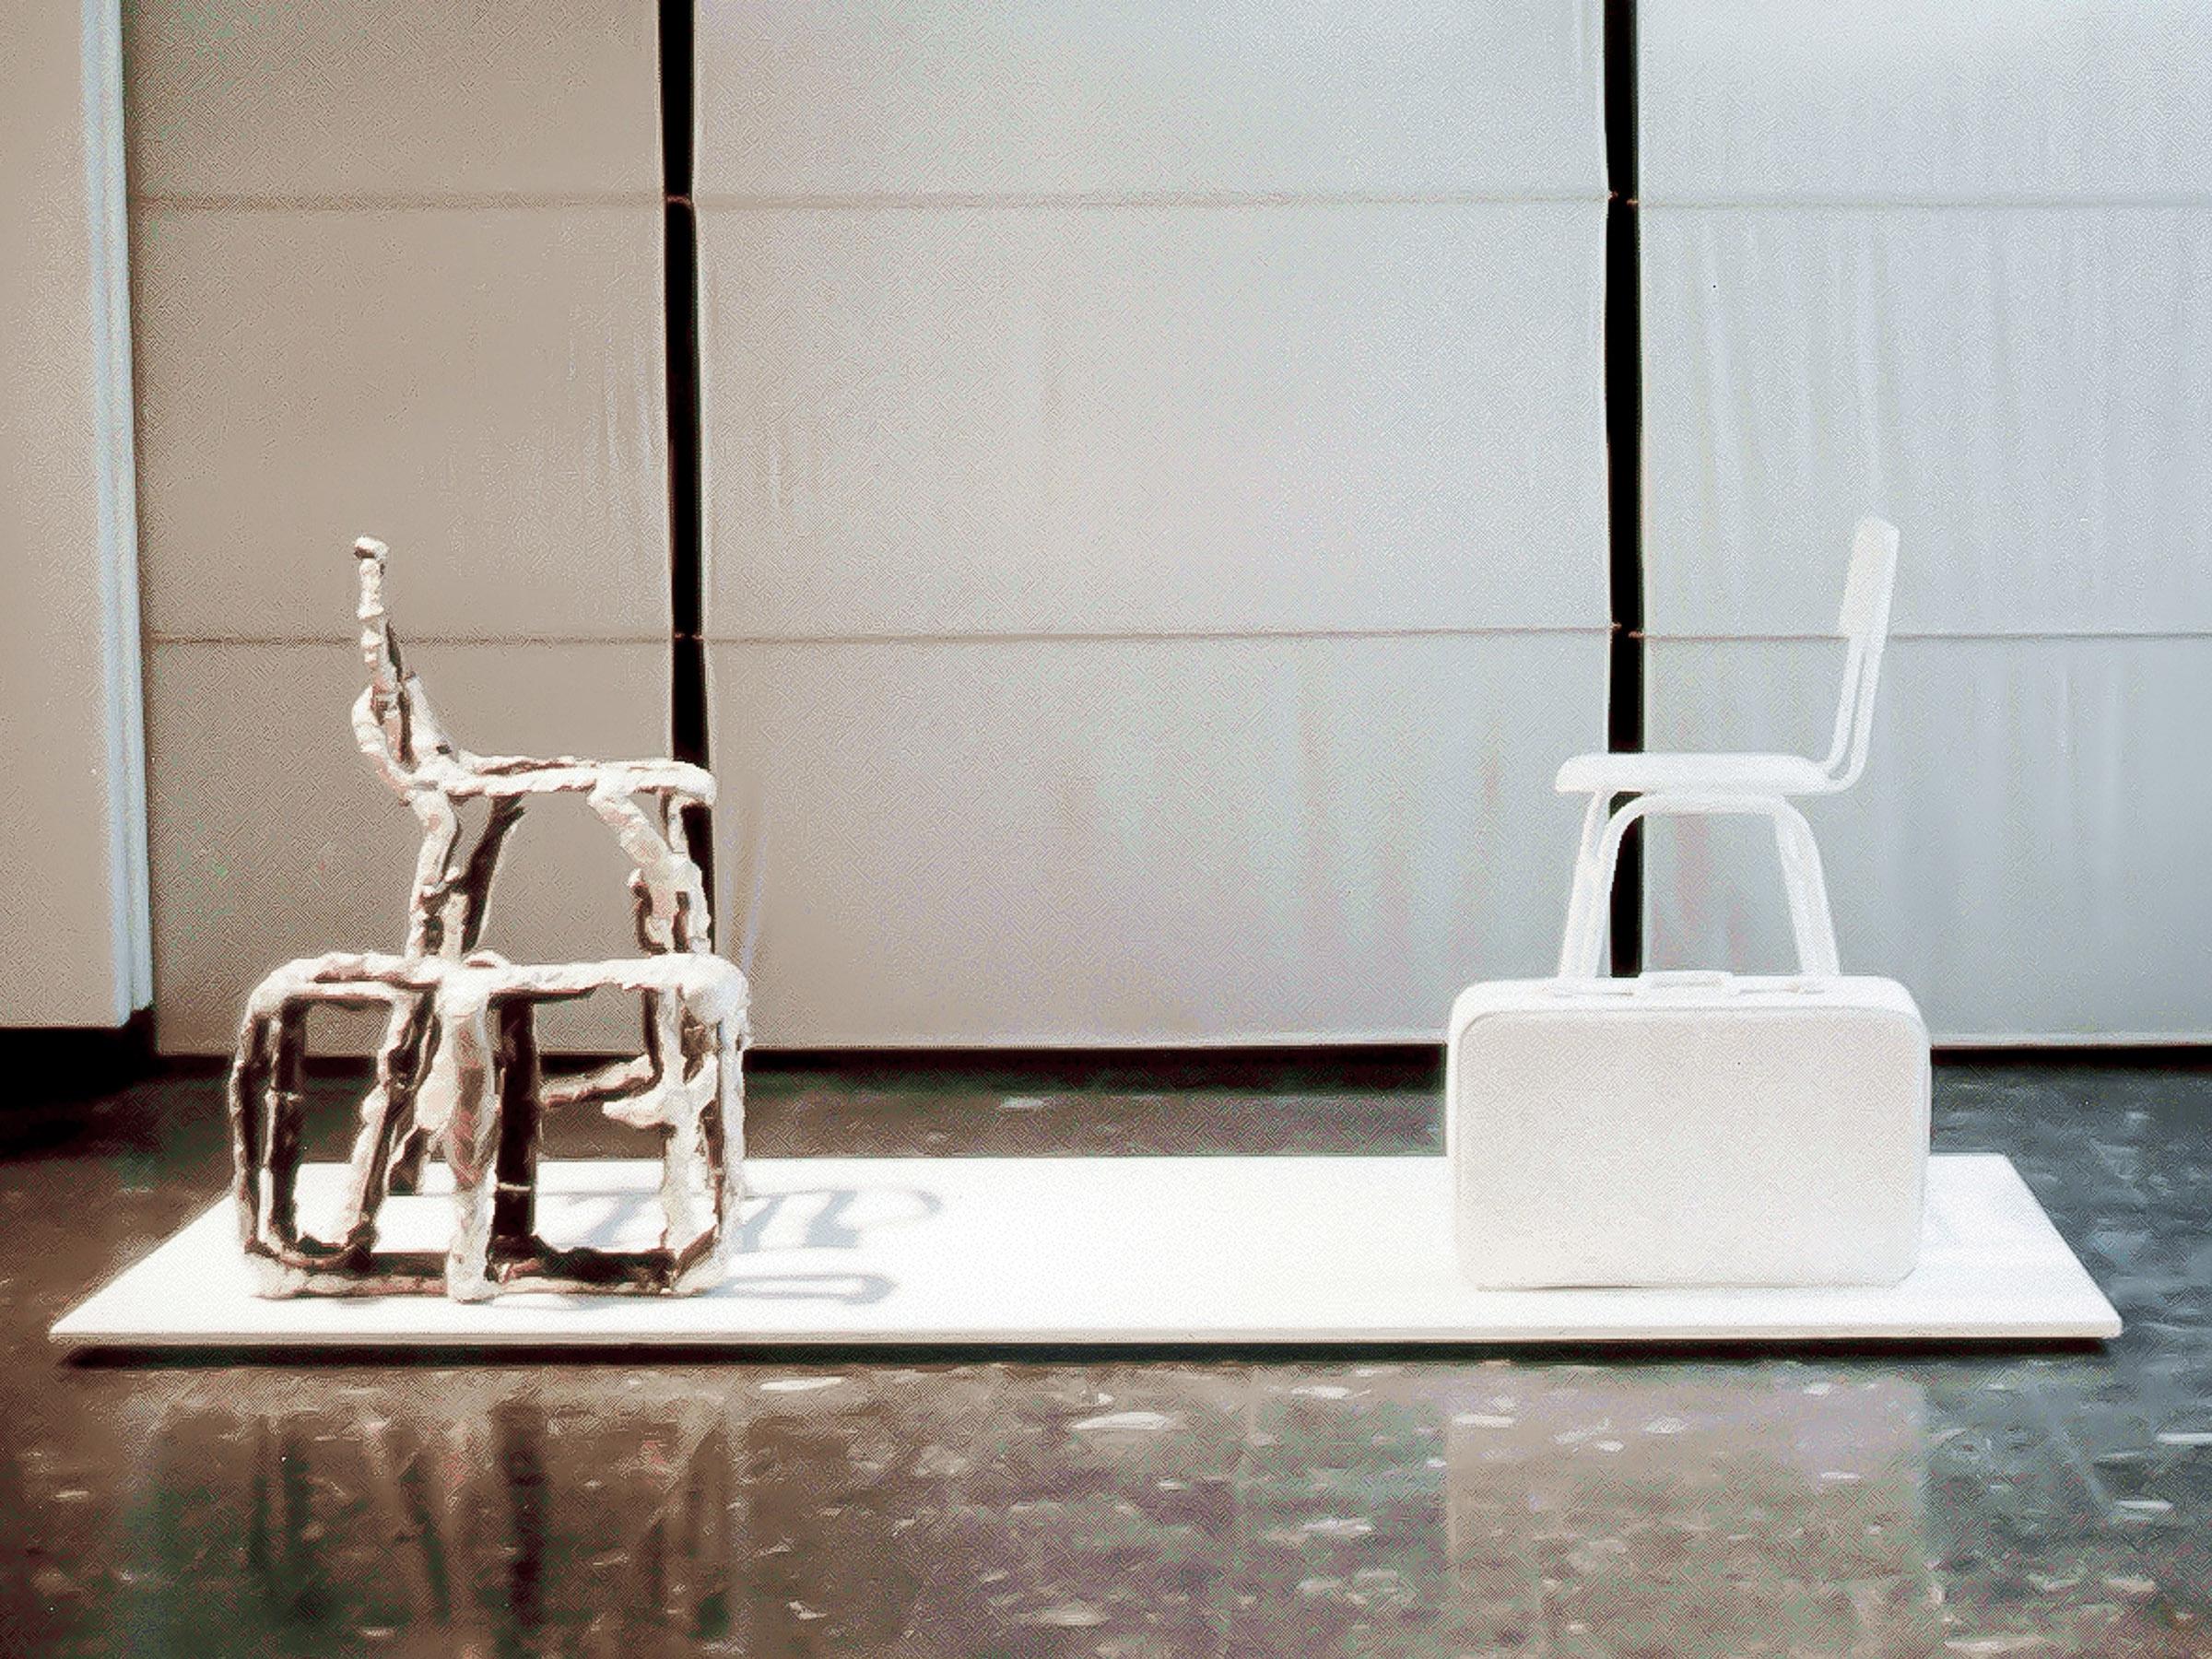 REALITÄT: multidisciplinary art by Dirk Rothe